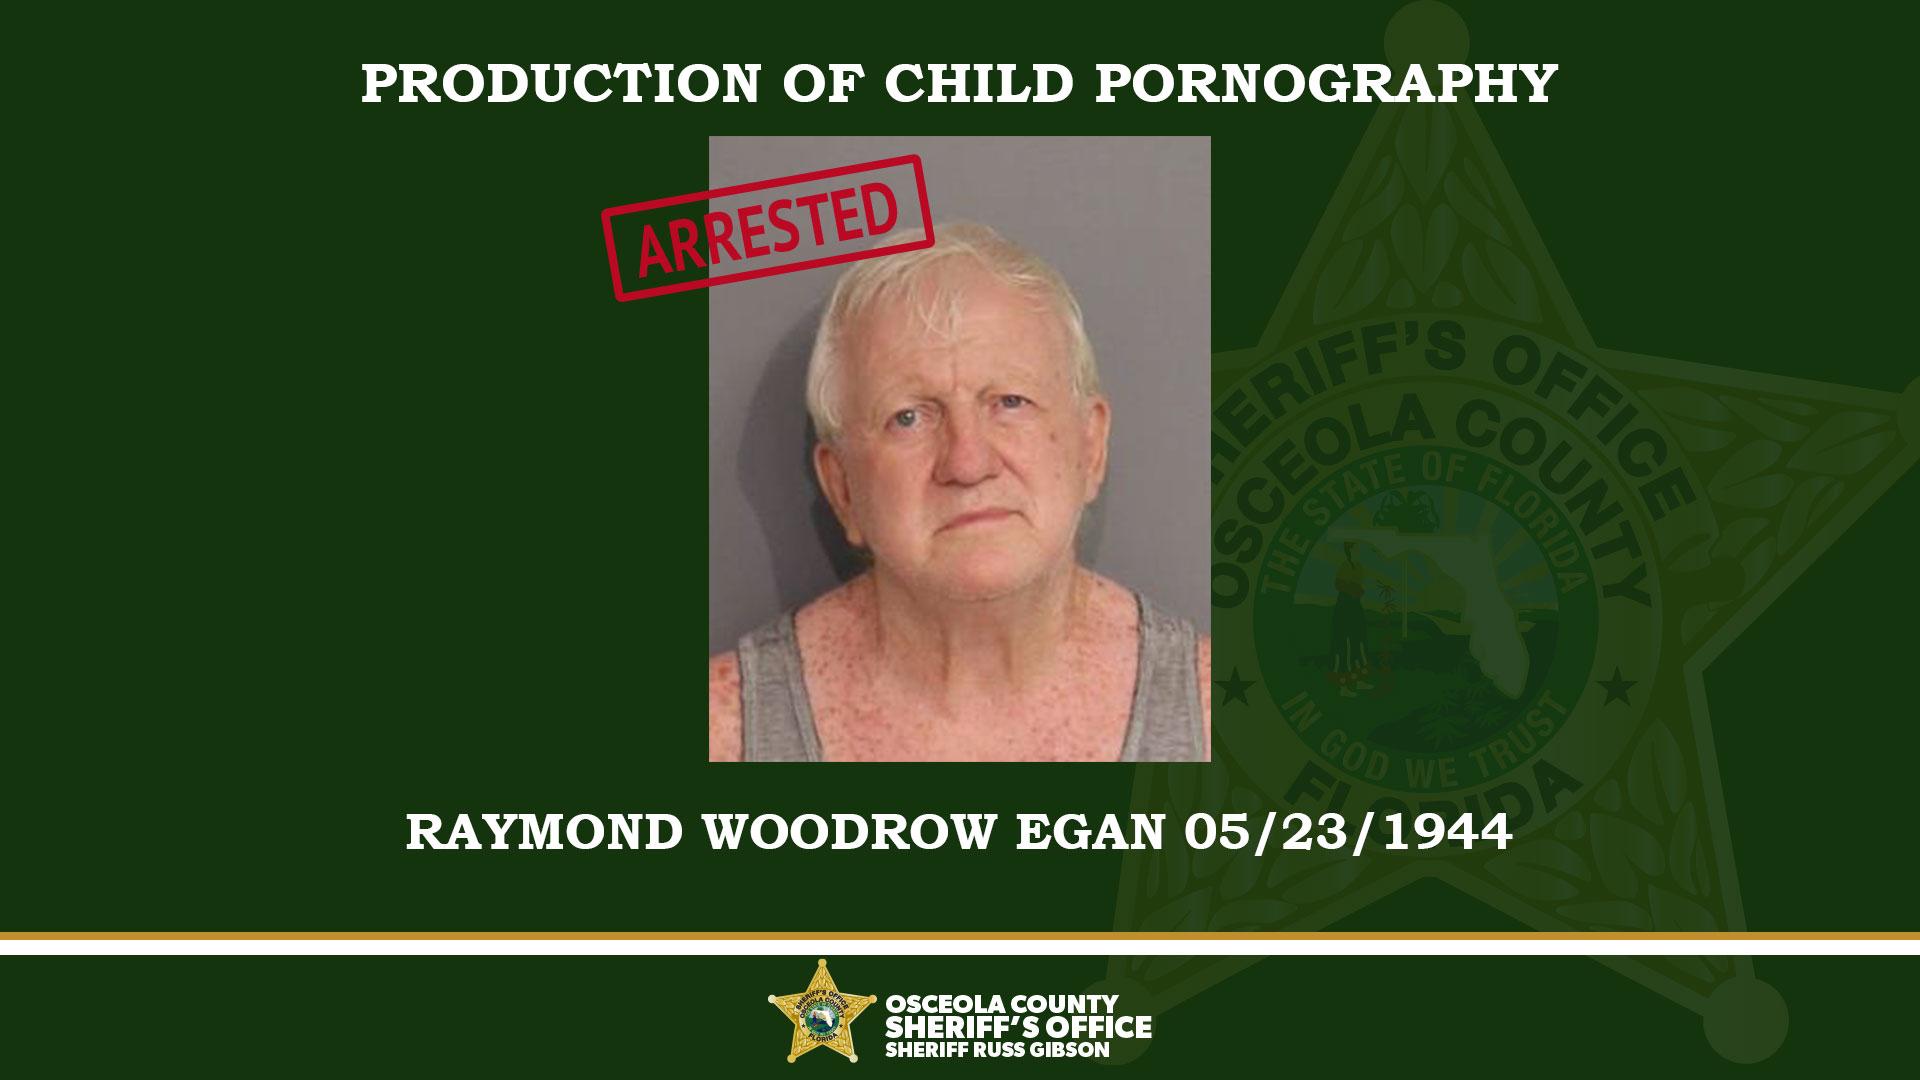 raymond_woodrow egan - Production of child pornography_r